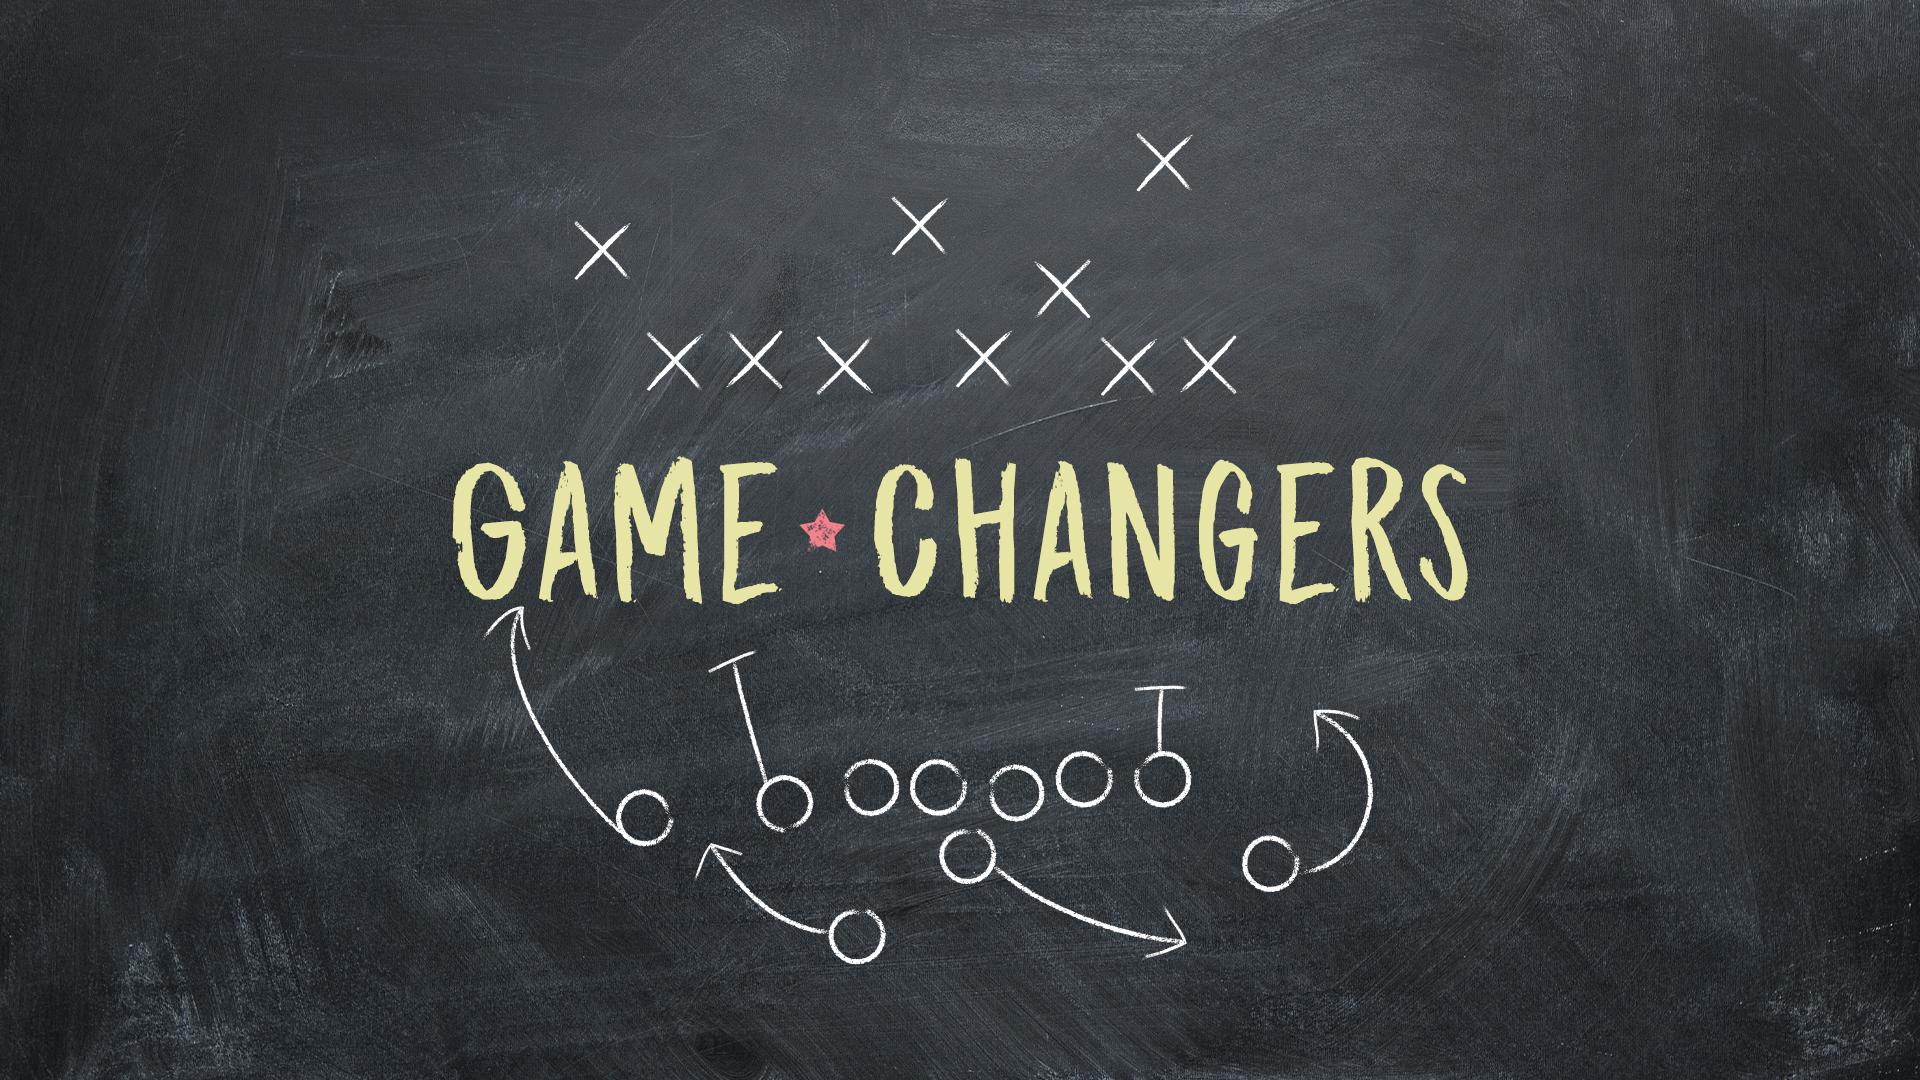 Game Changers_1920x1080.jpg